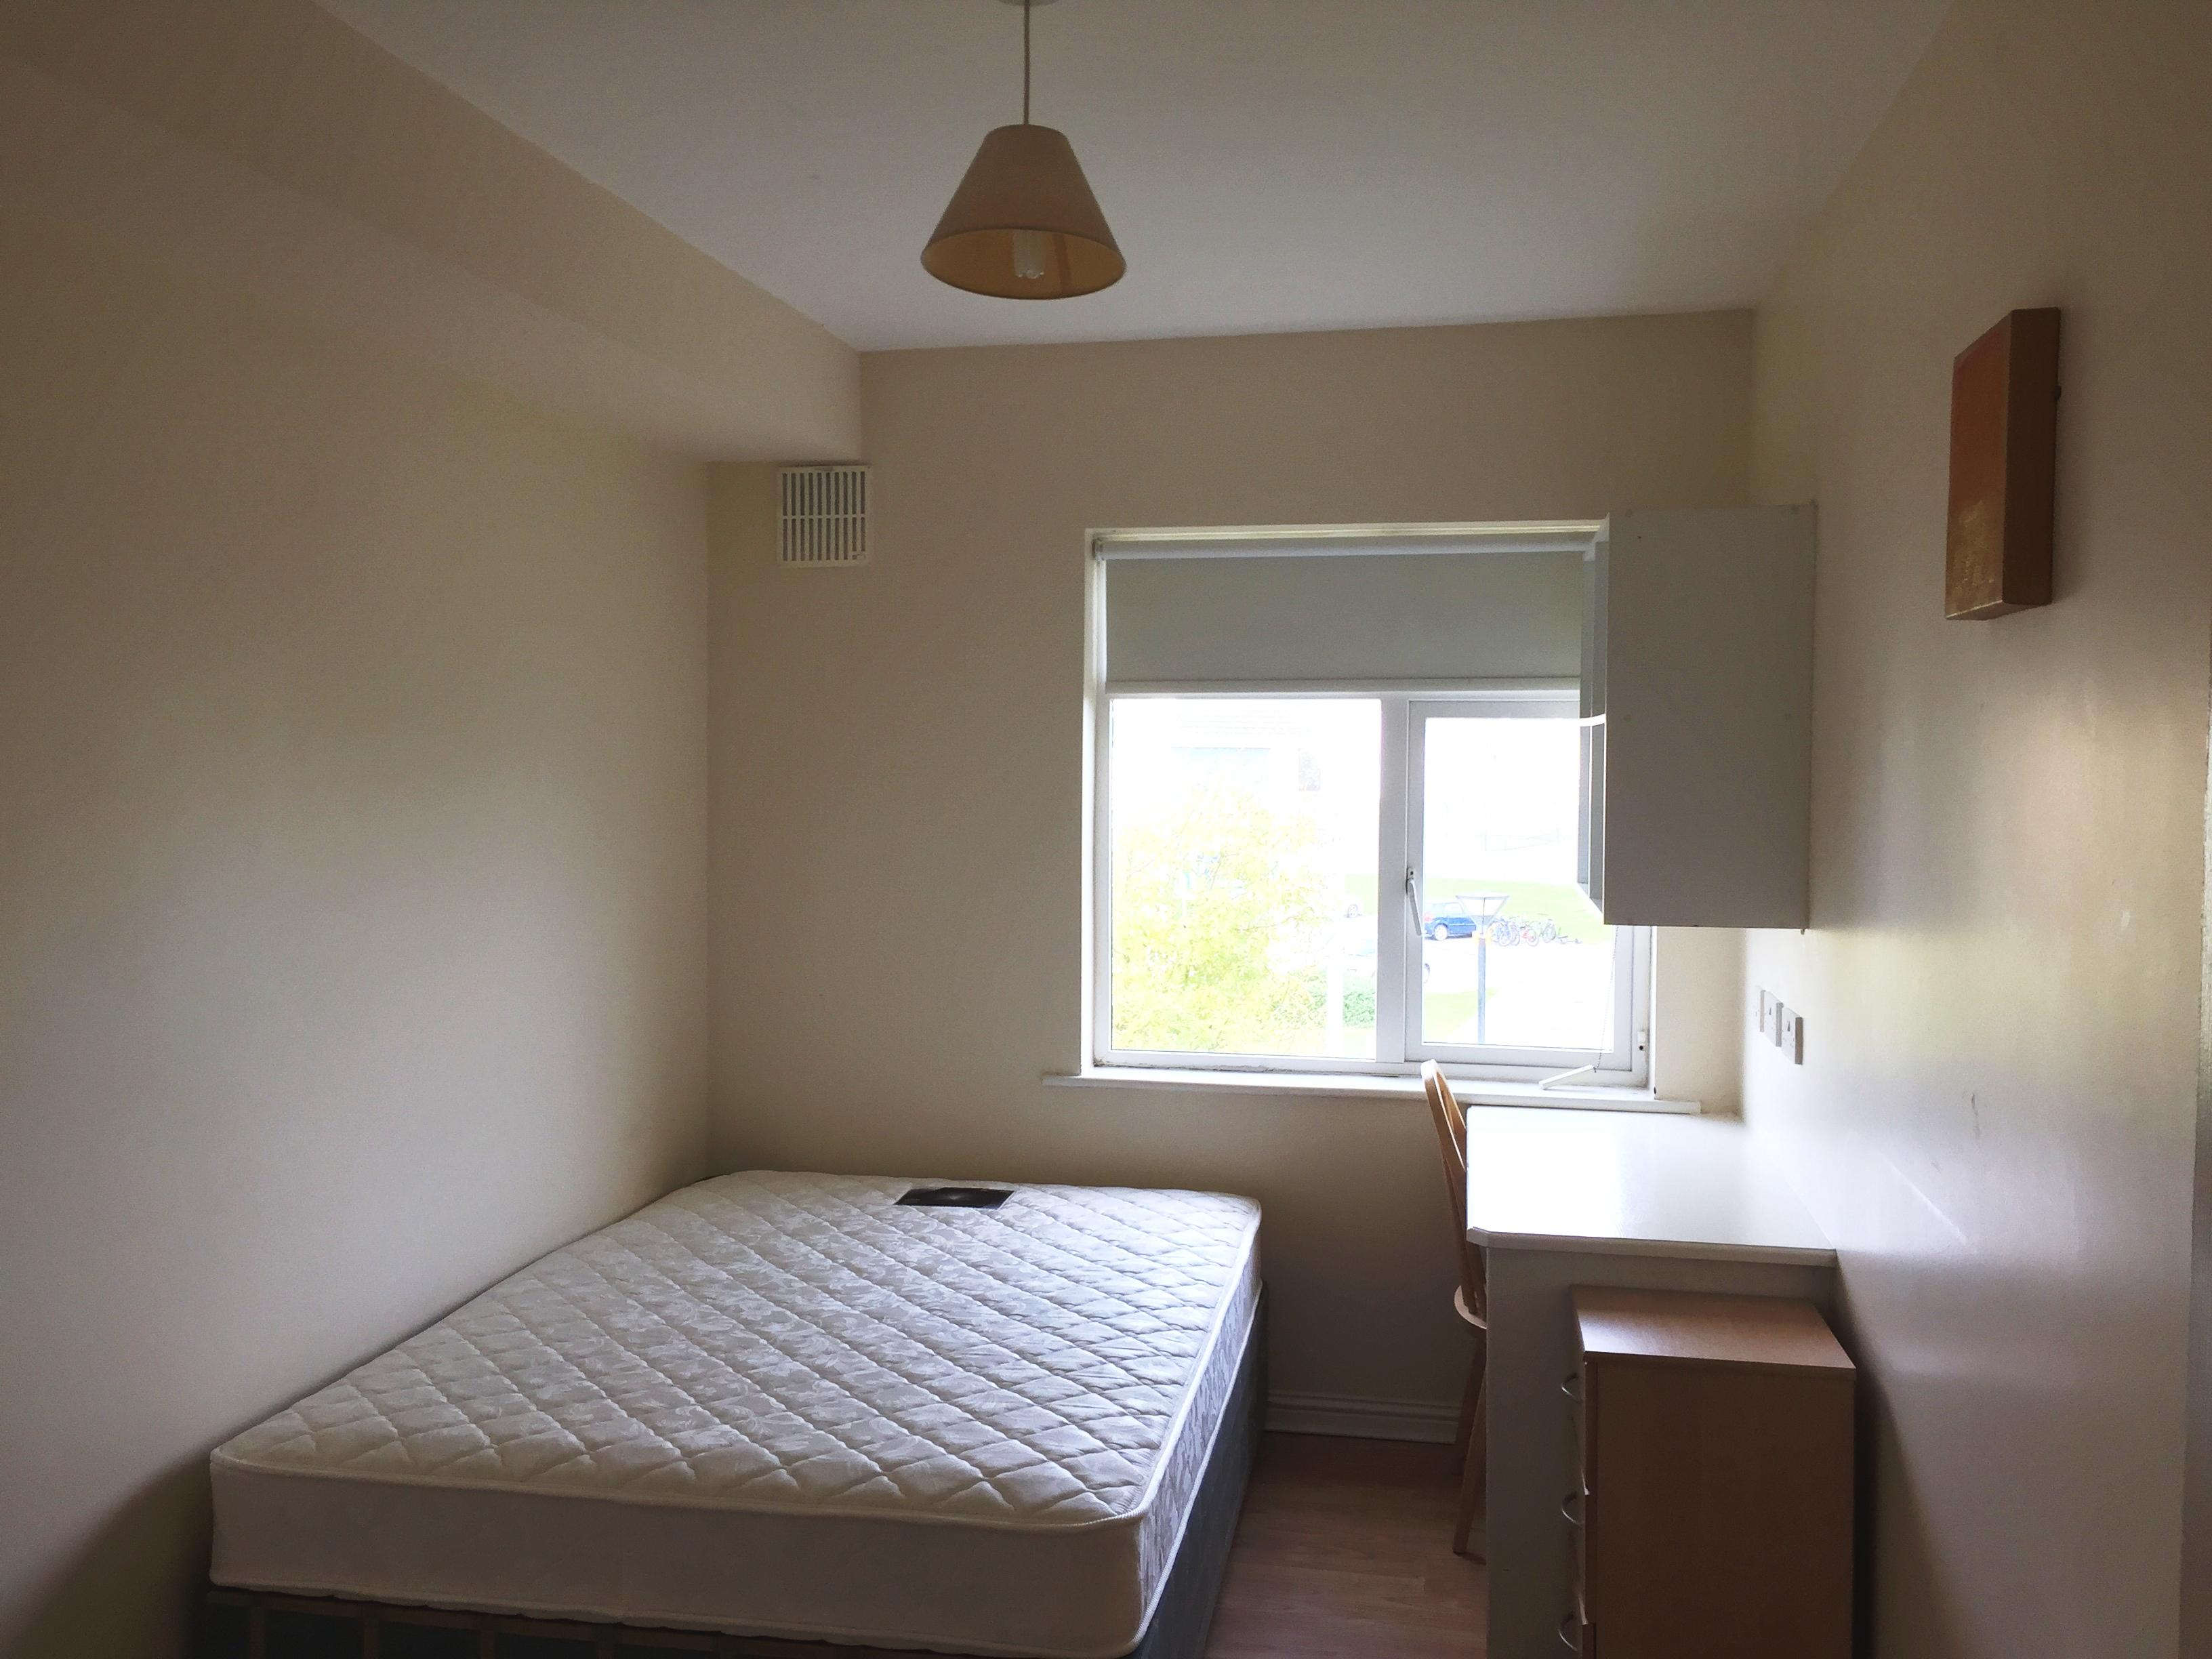 2 Bedroom Apartment Gleann Na Ri Murrough Renmore